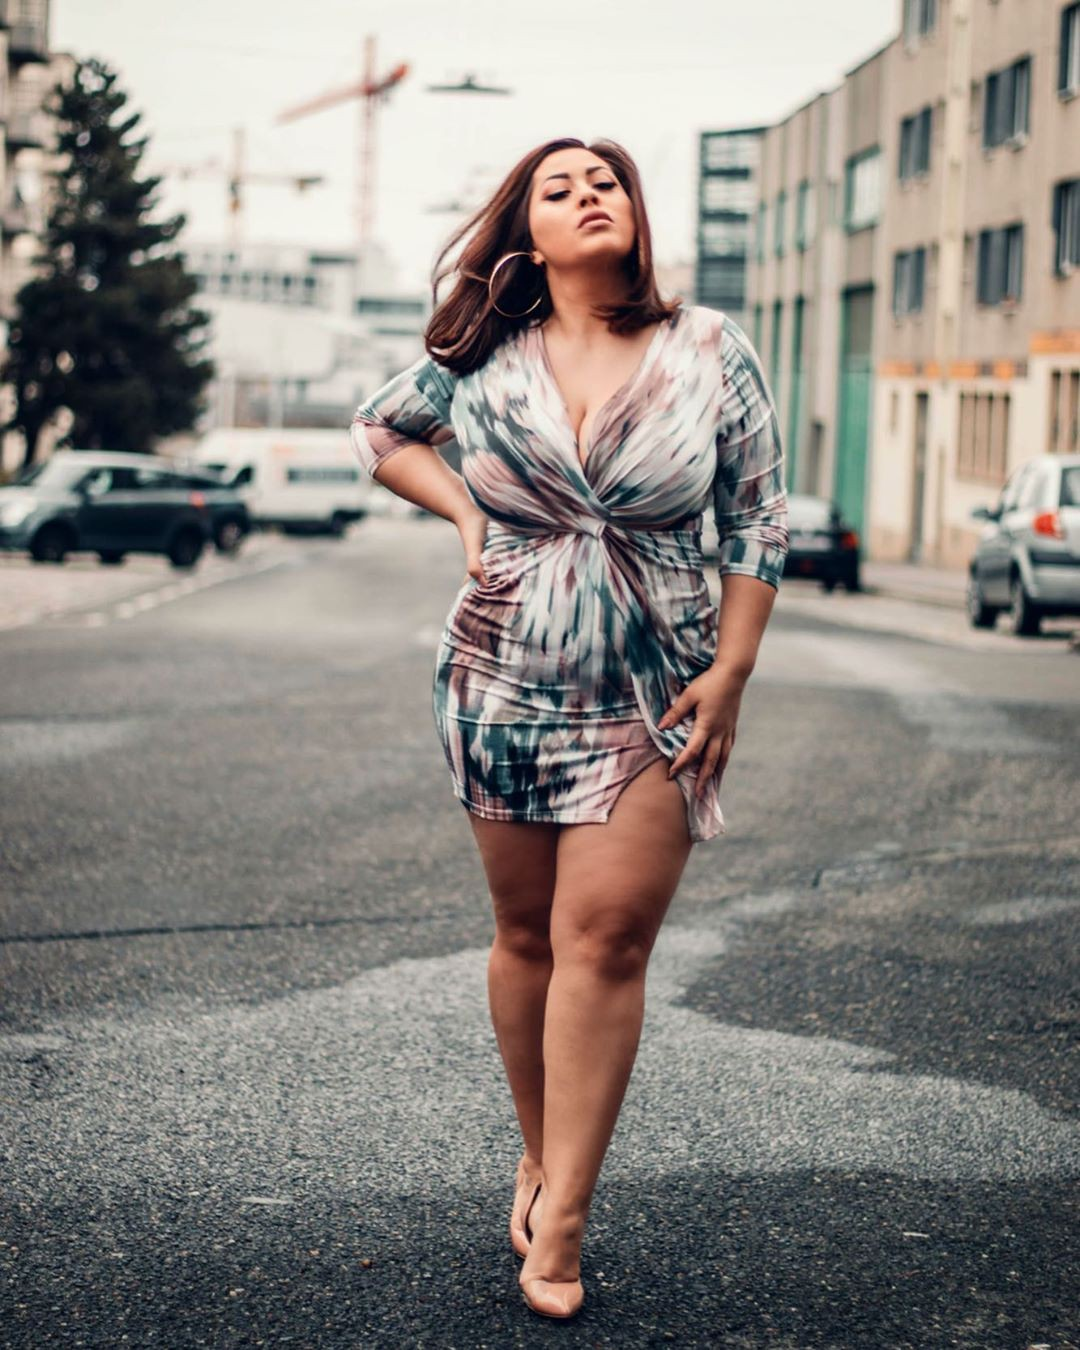 Costina Ana-Maria dress colour outfit, photoshoot ideas, photography ideas